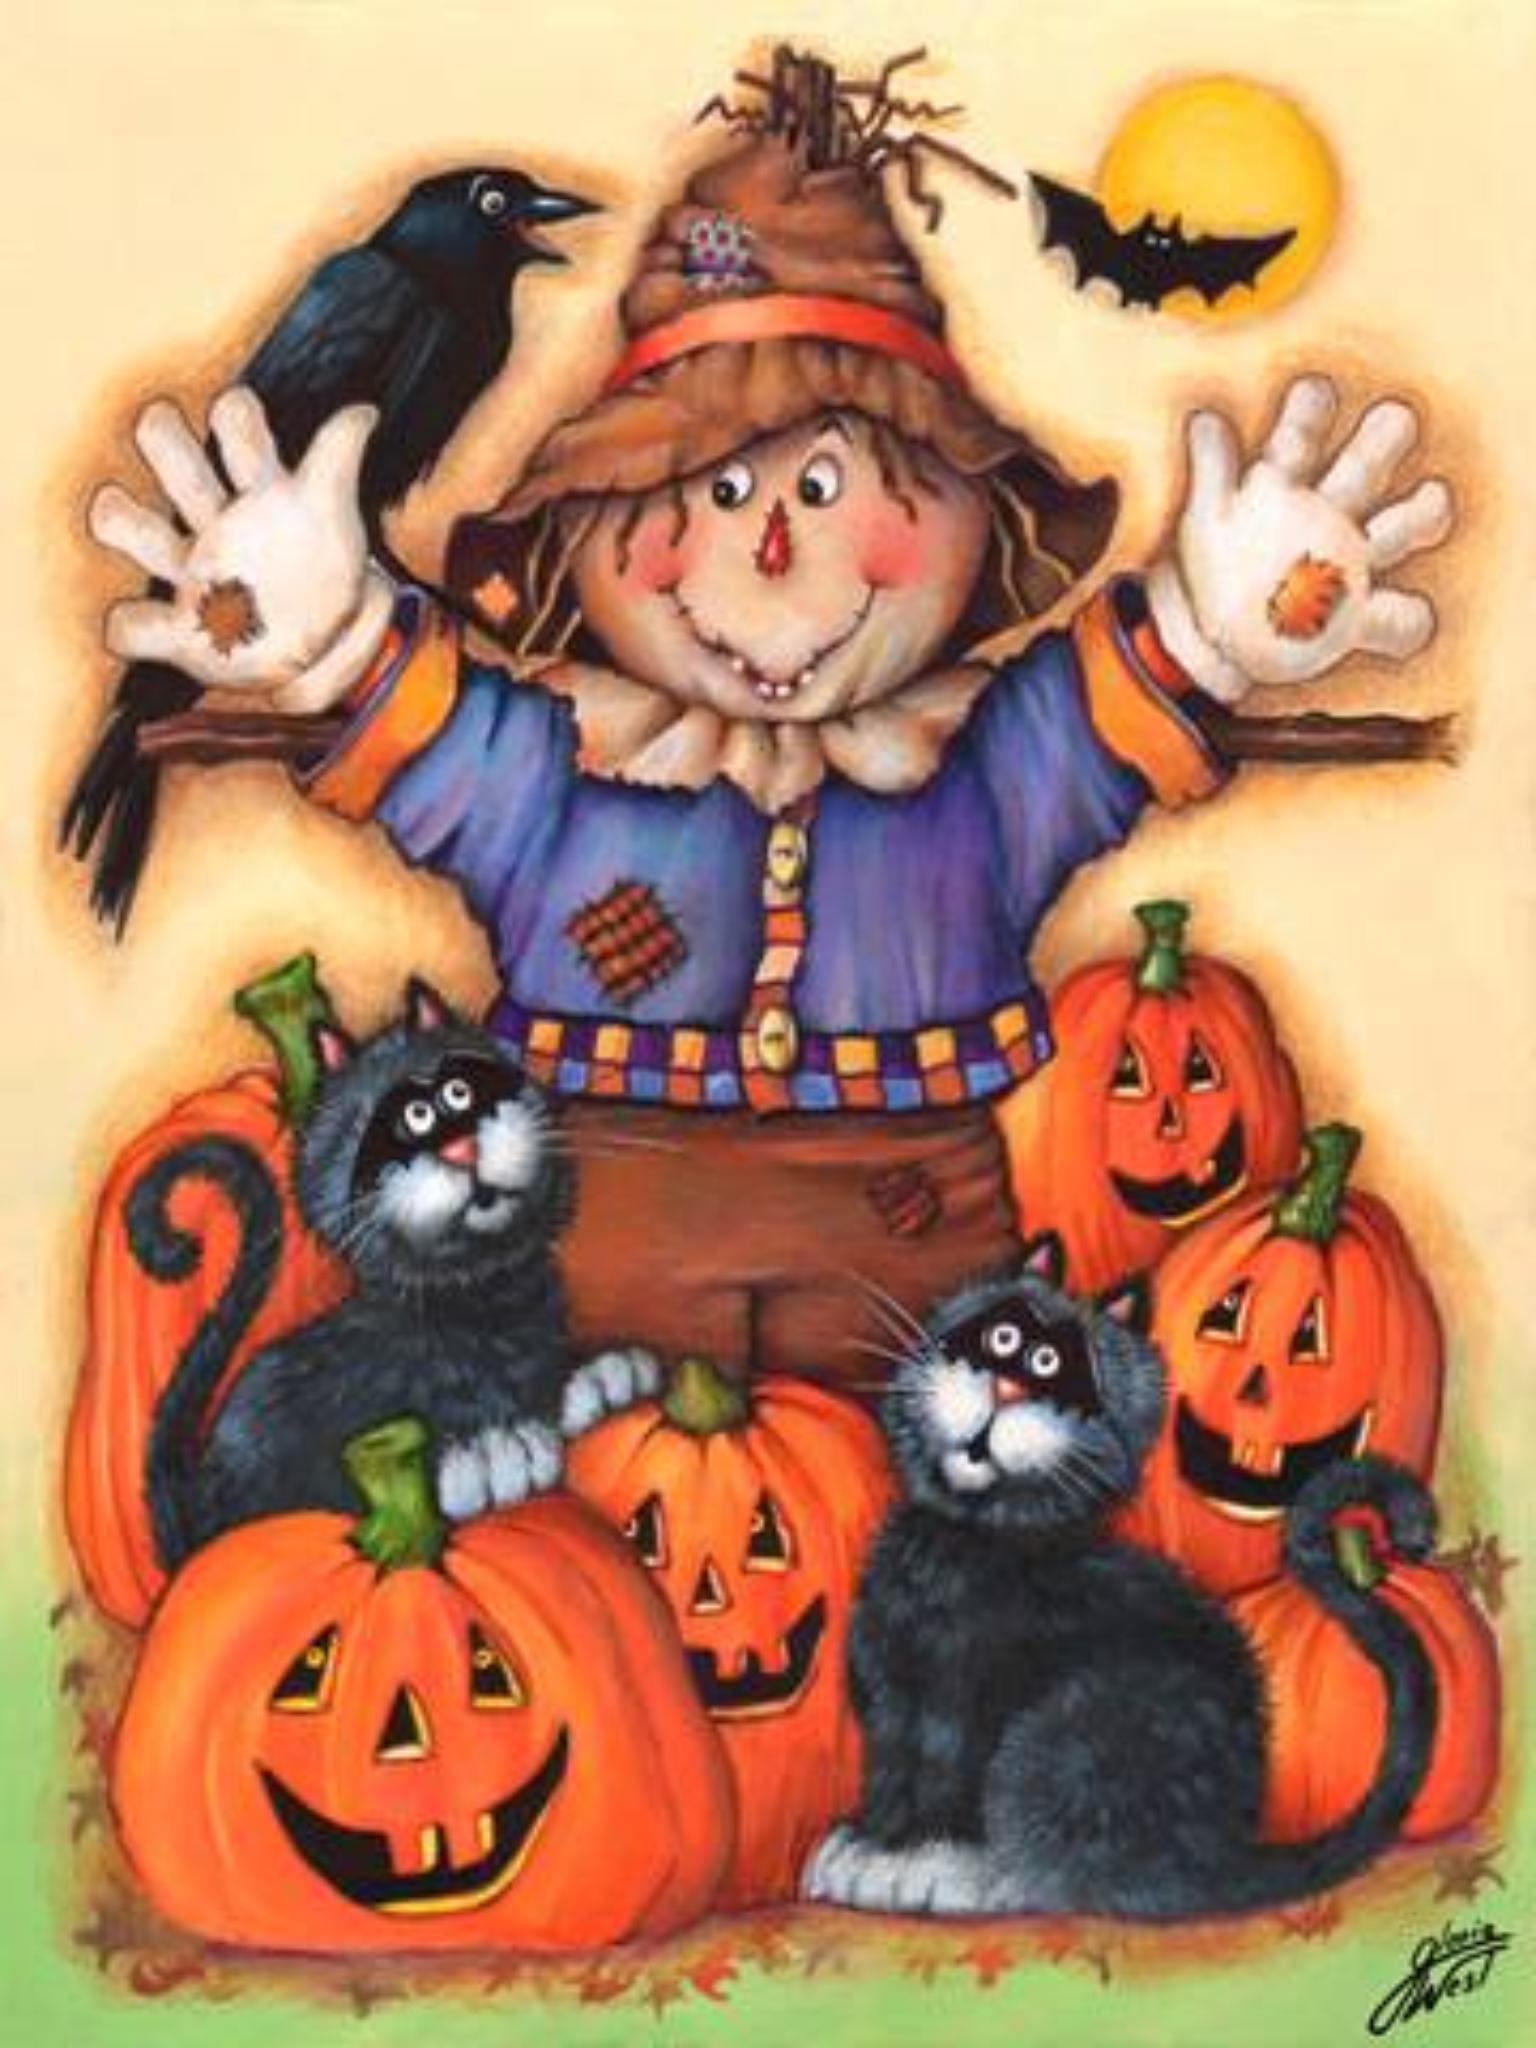 Black Cat clipart pumpkin patch Scarecrow's Pinterest catalog Halloween The